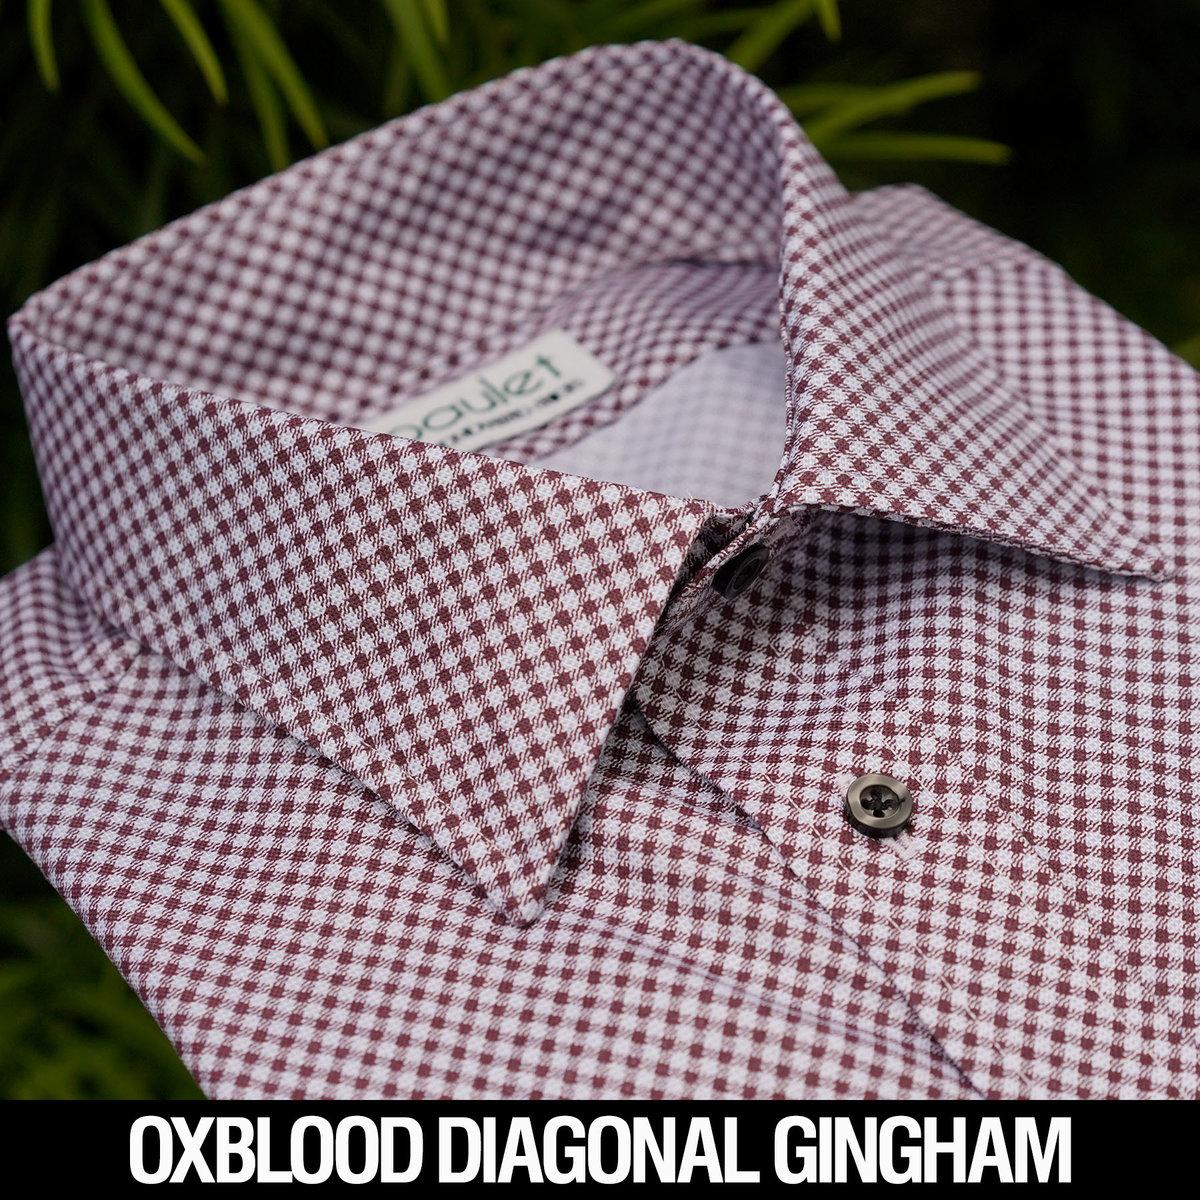 Oxblood Diagonal Gingham.jpg